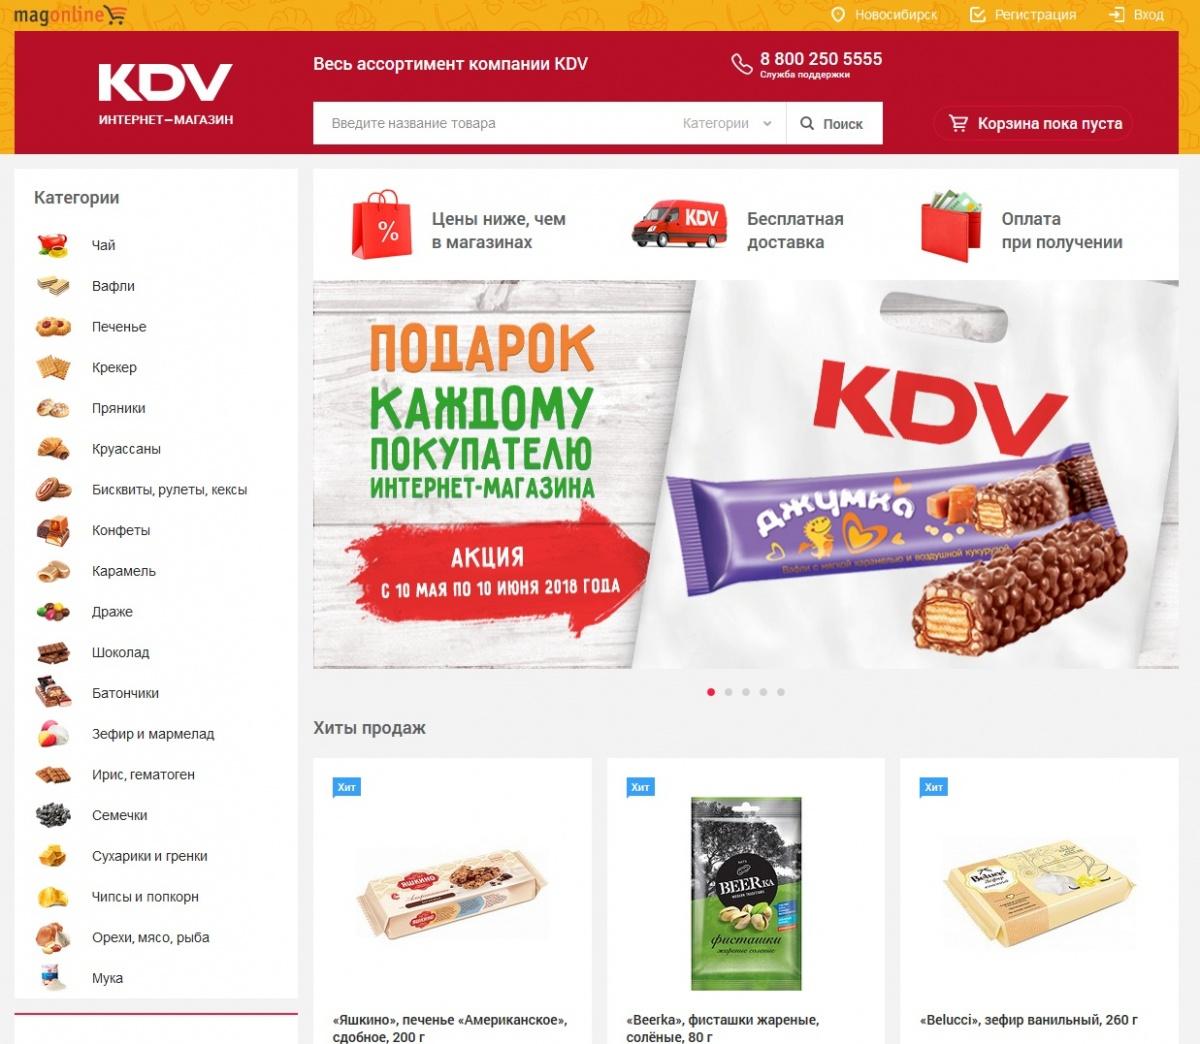 Продукция интернет-магазина KDV.